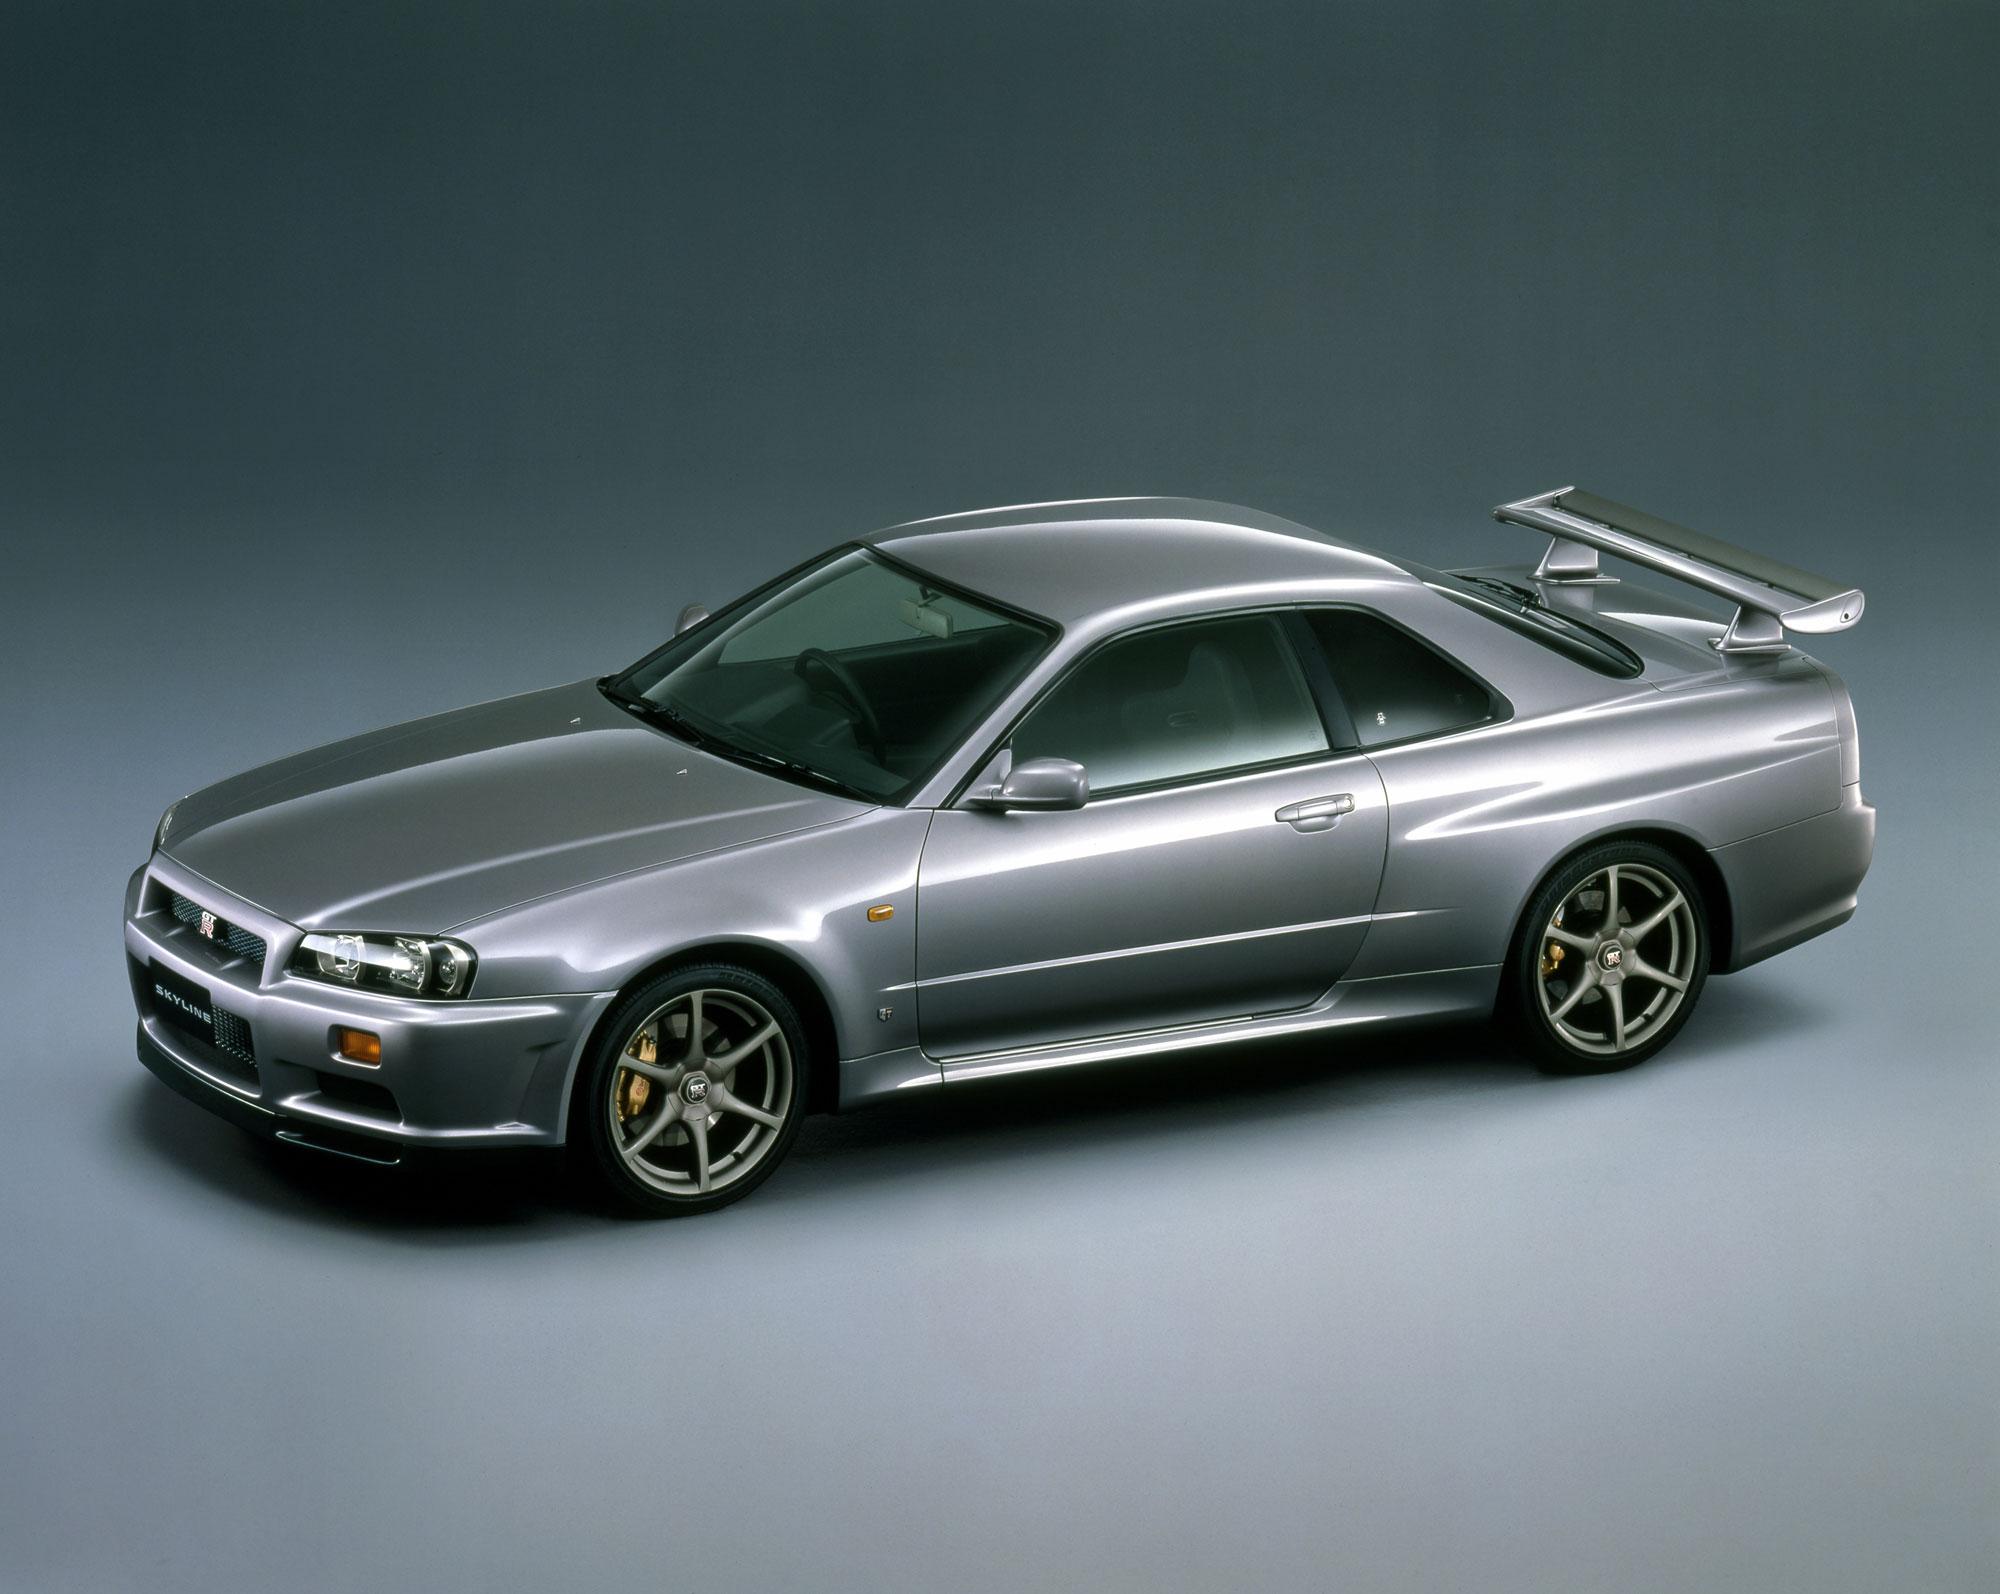 1999 Skyline GT-R front three-quarter